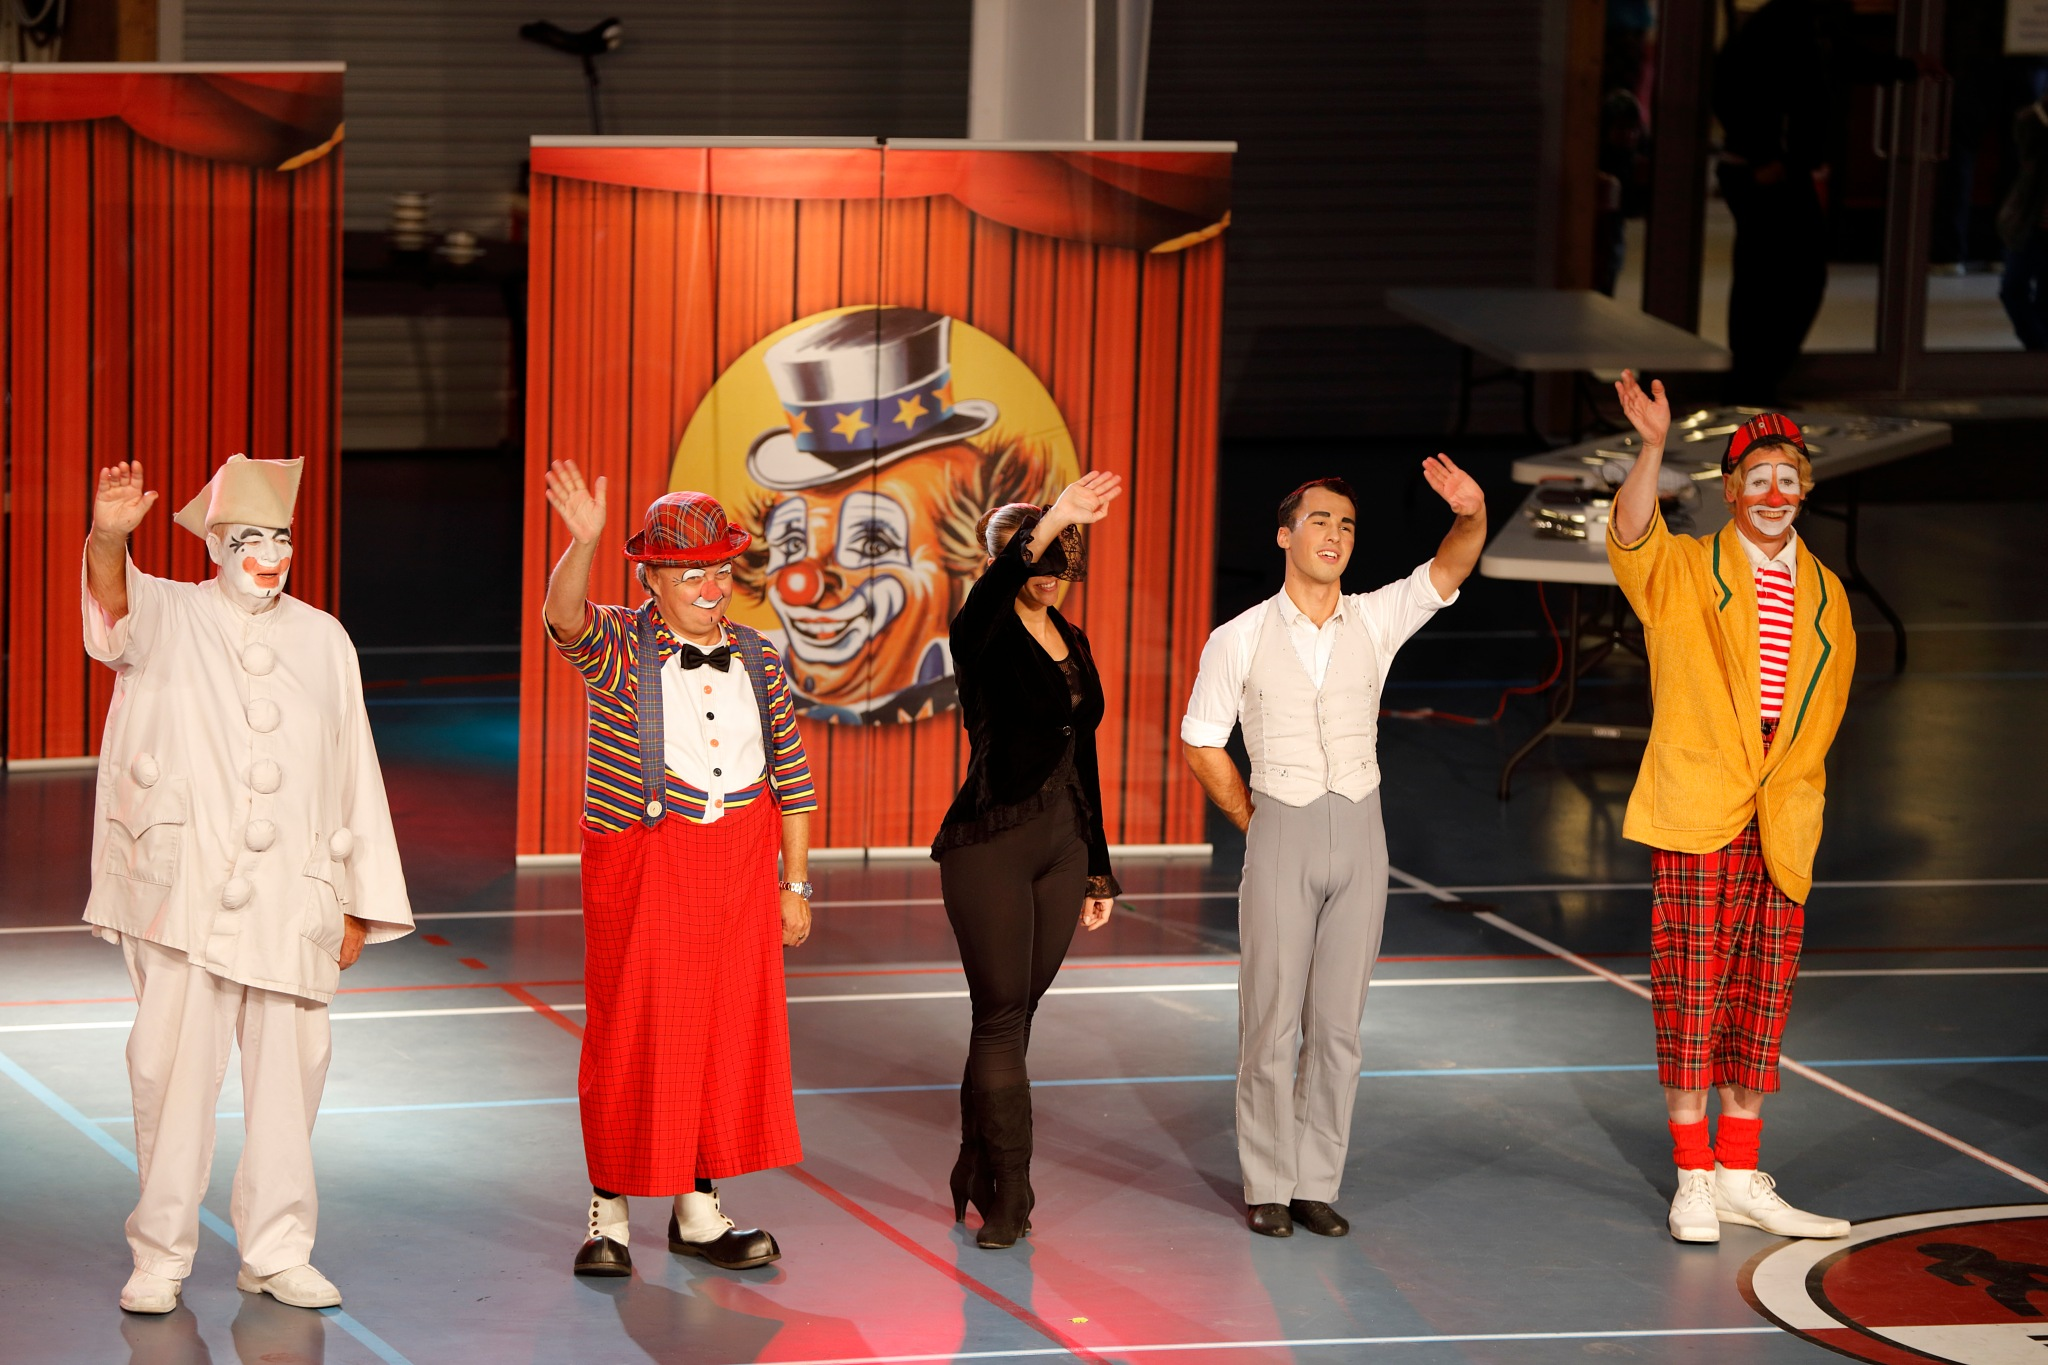 cirkus arena forestiling slut Nuuk by Tom Augo Lynge